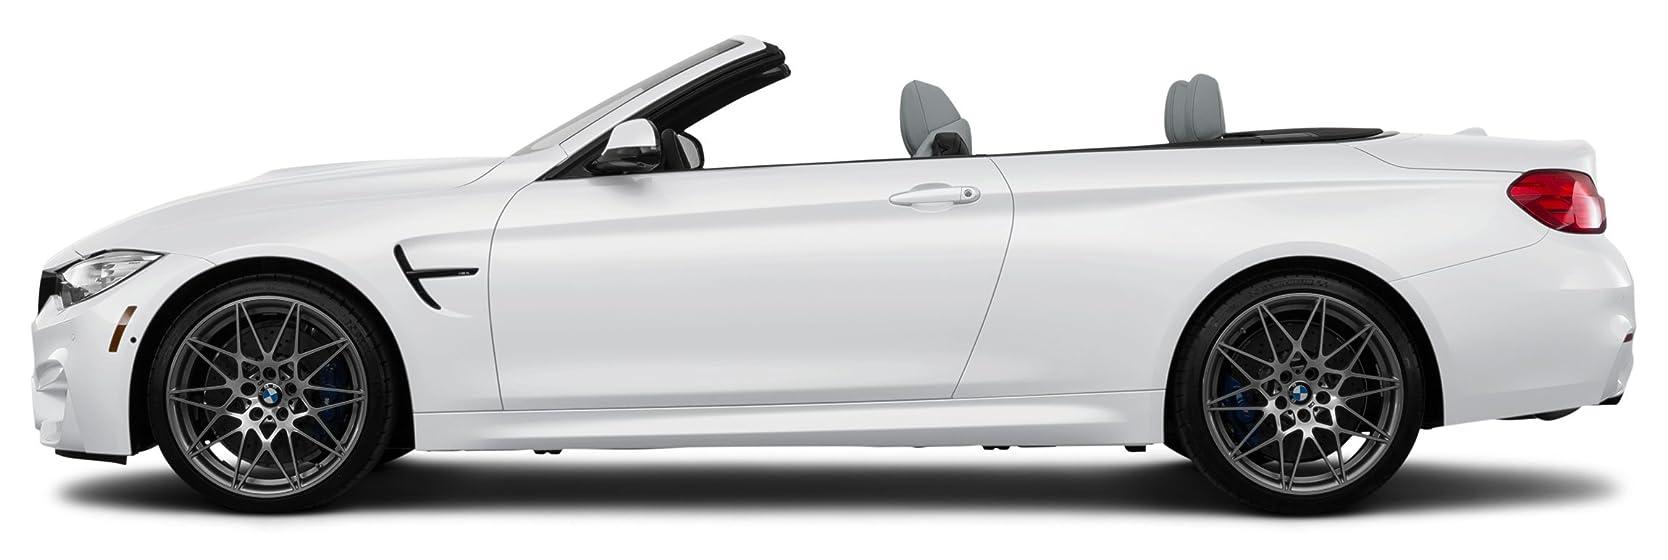 435i white convertible dress